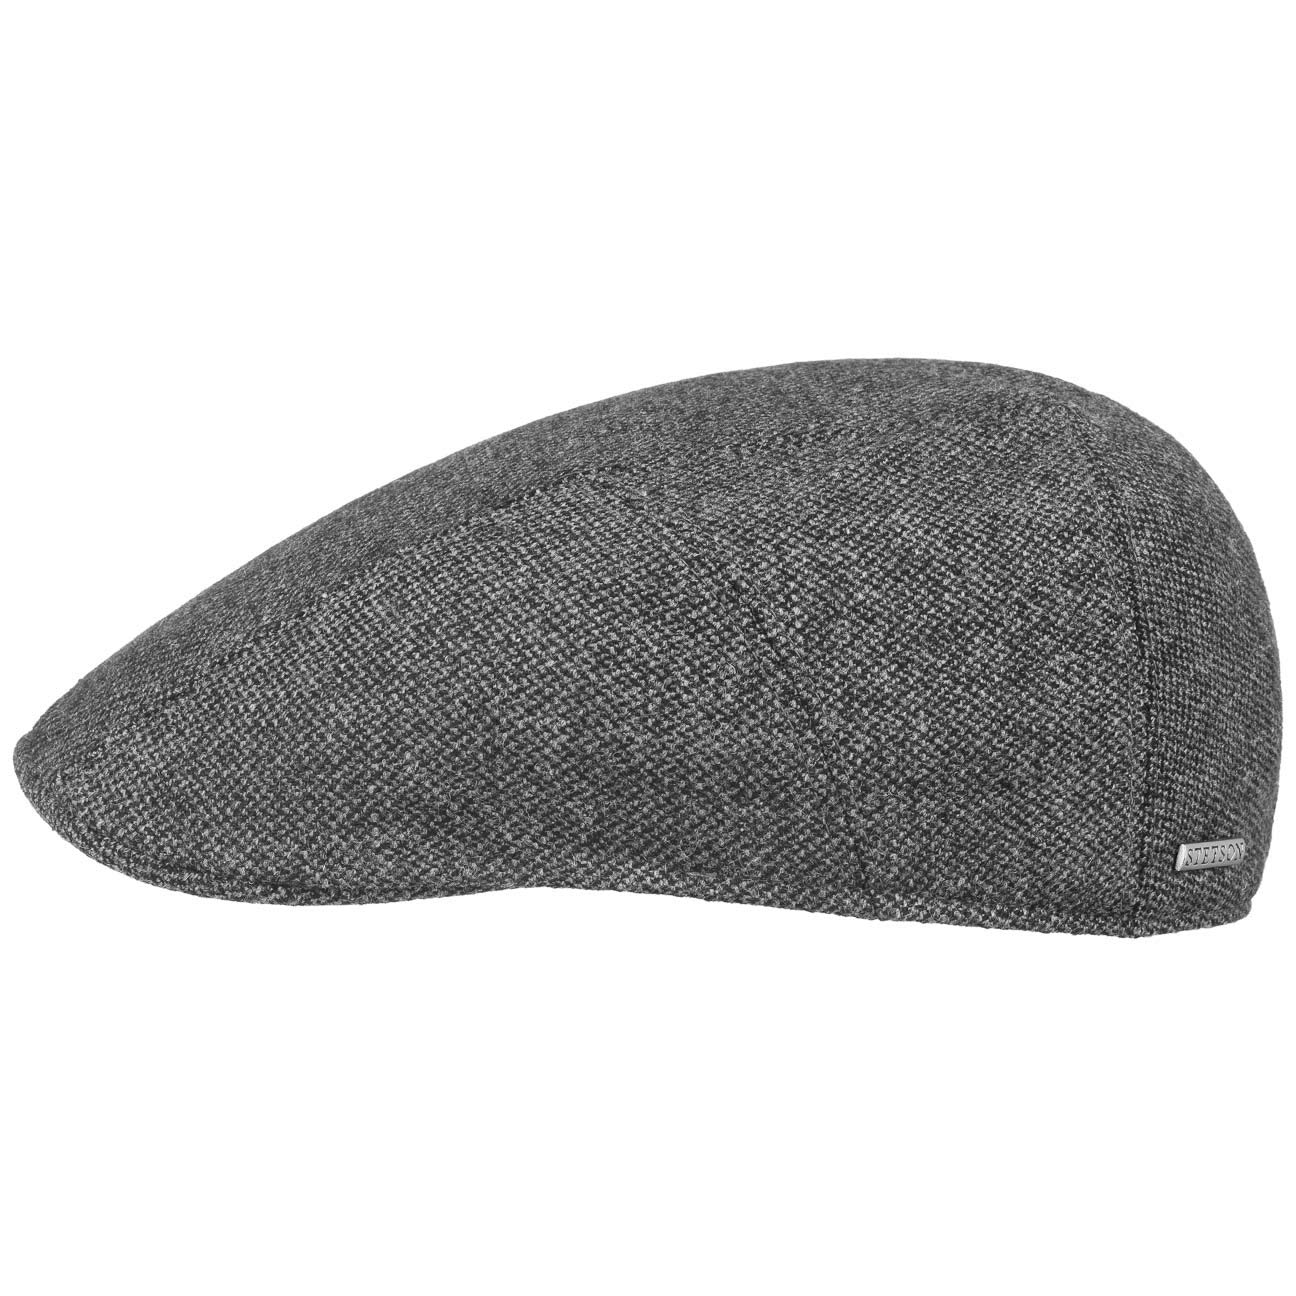 Made in The EU Stetson Ridge Wool Flat Cap Men